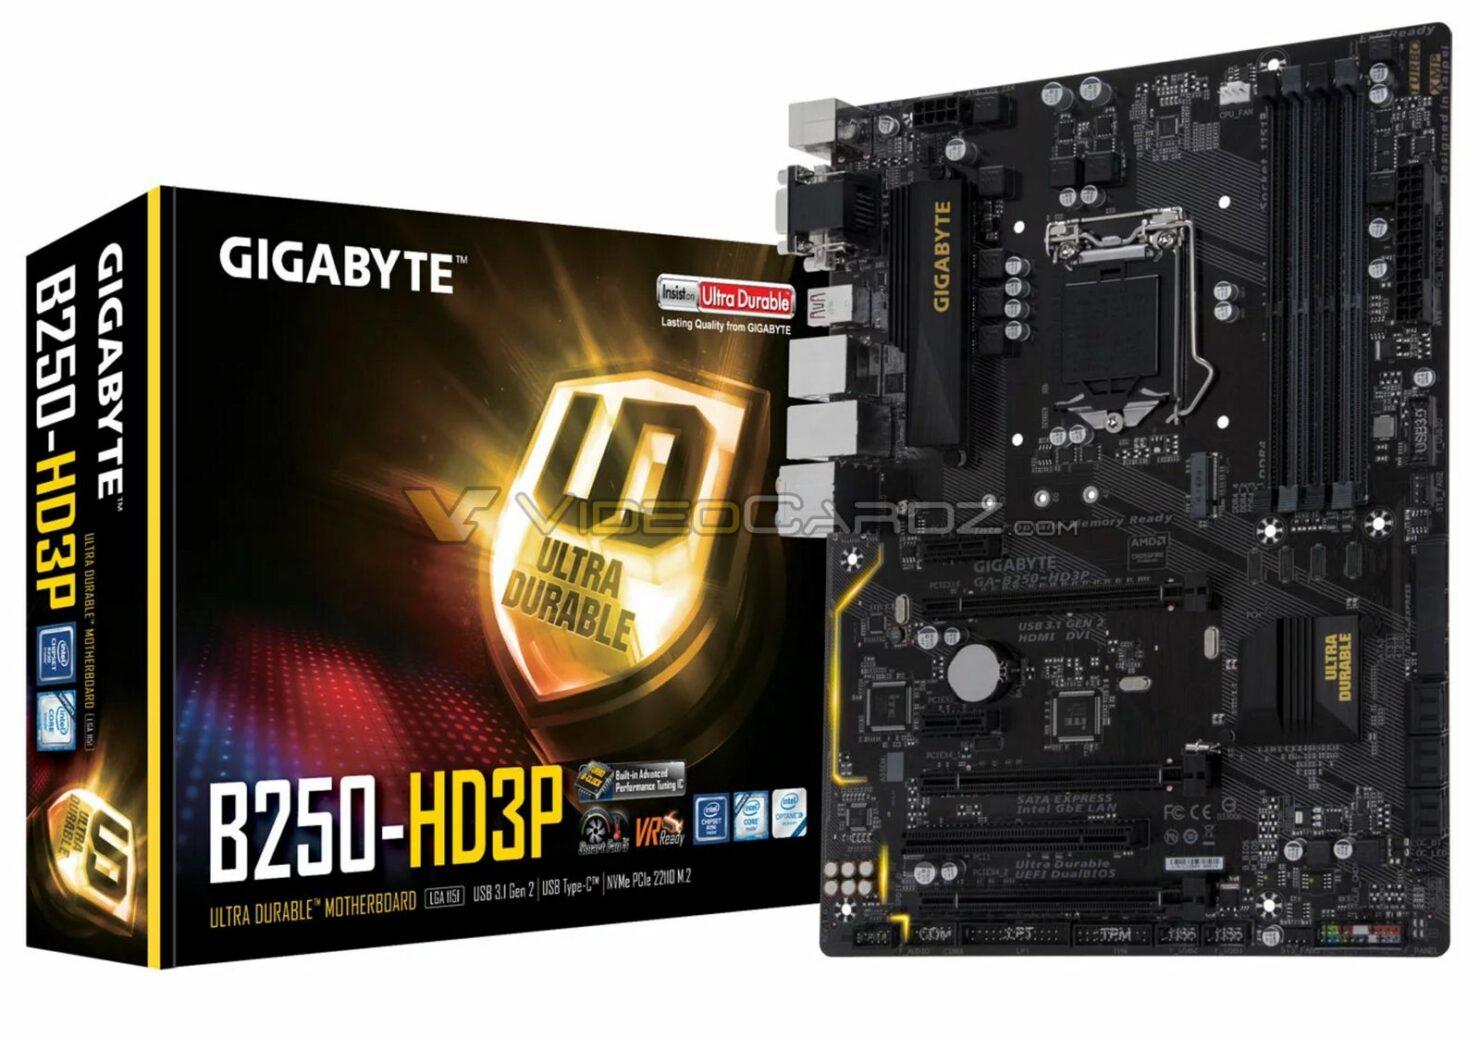 gigabyte-b250-hd3p